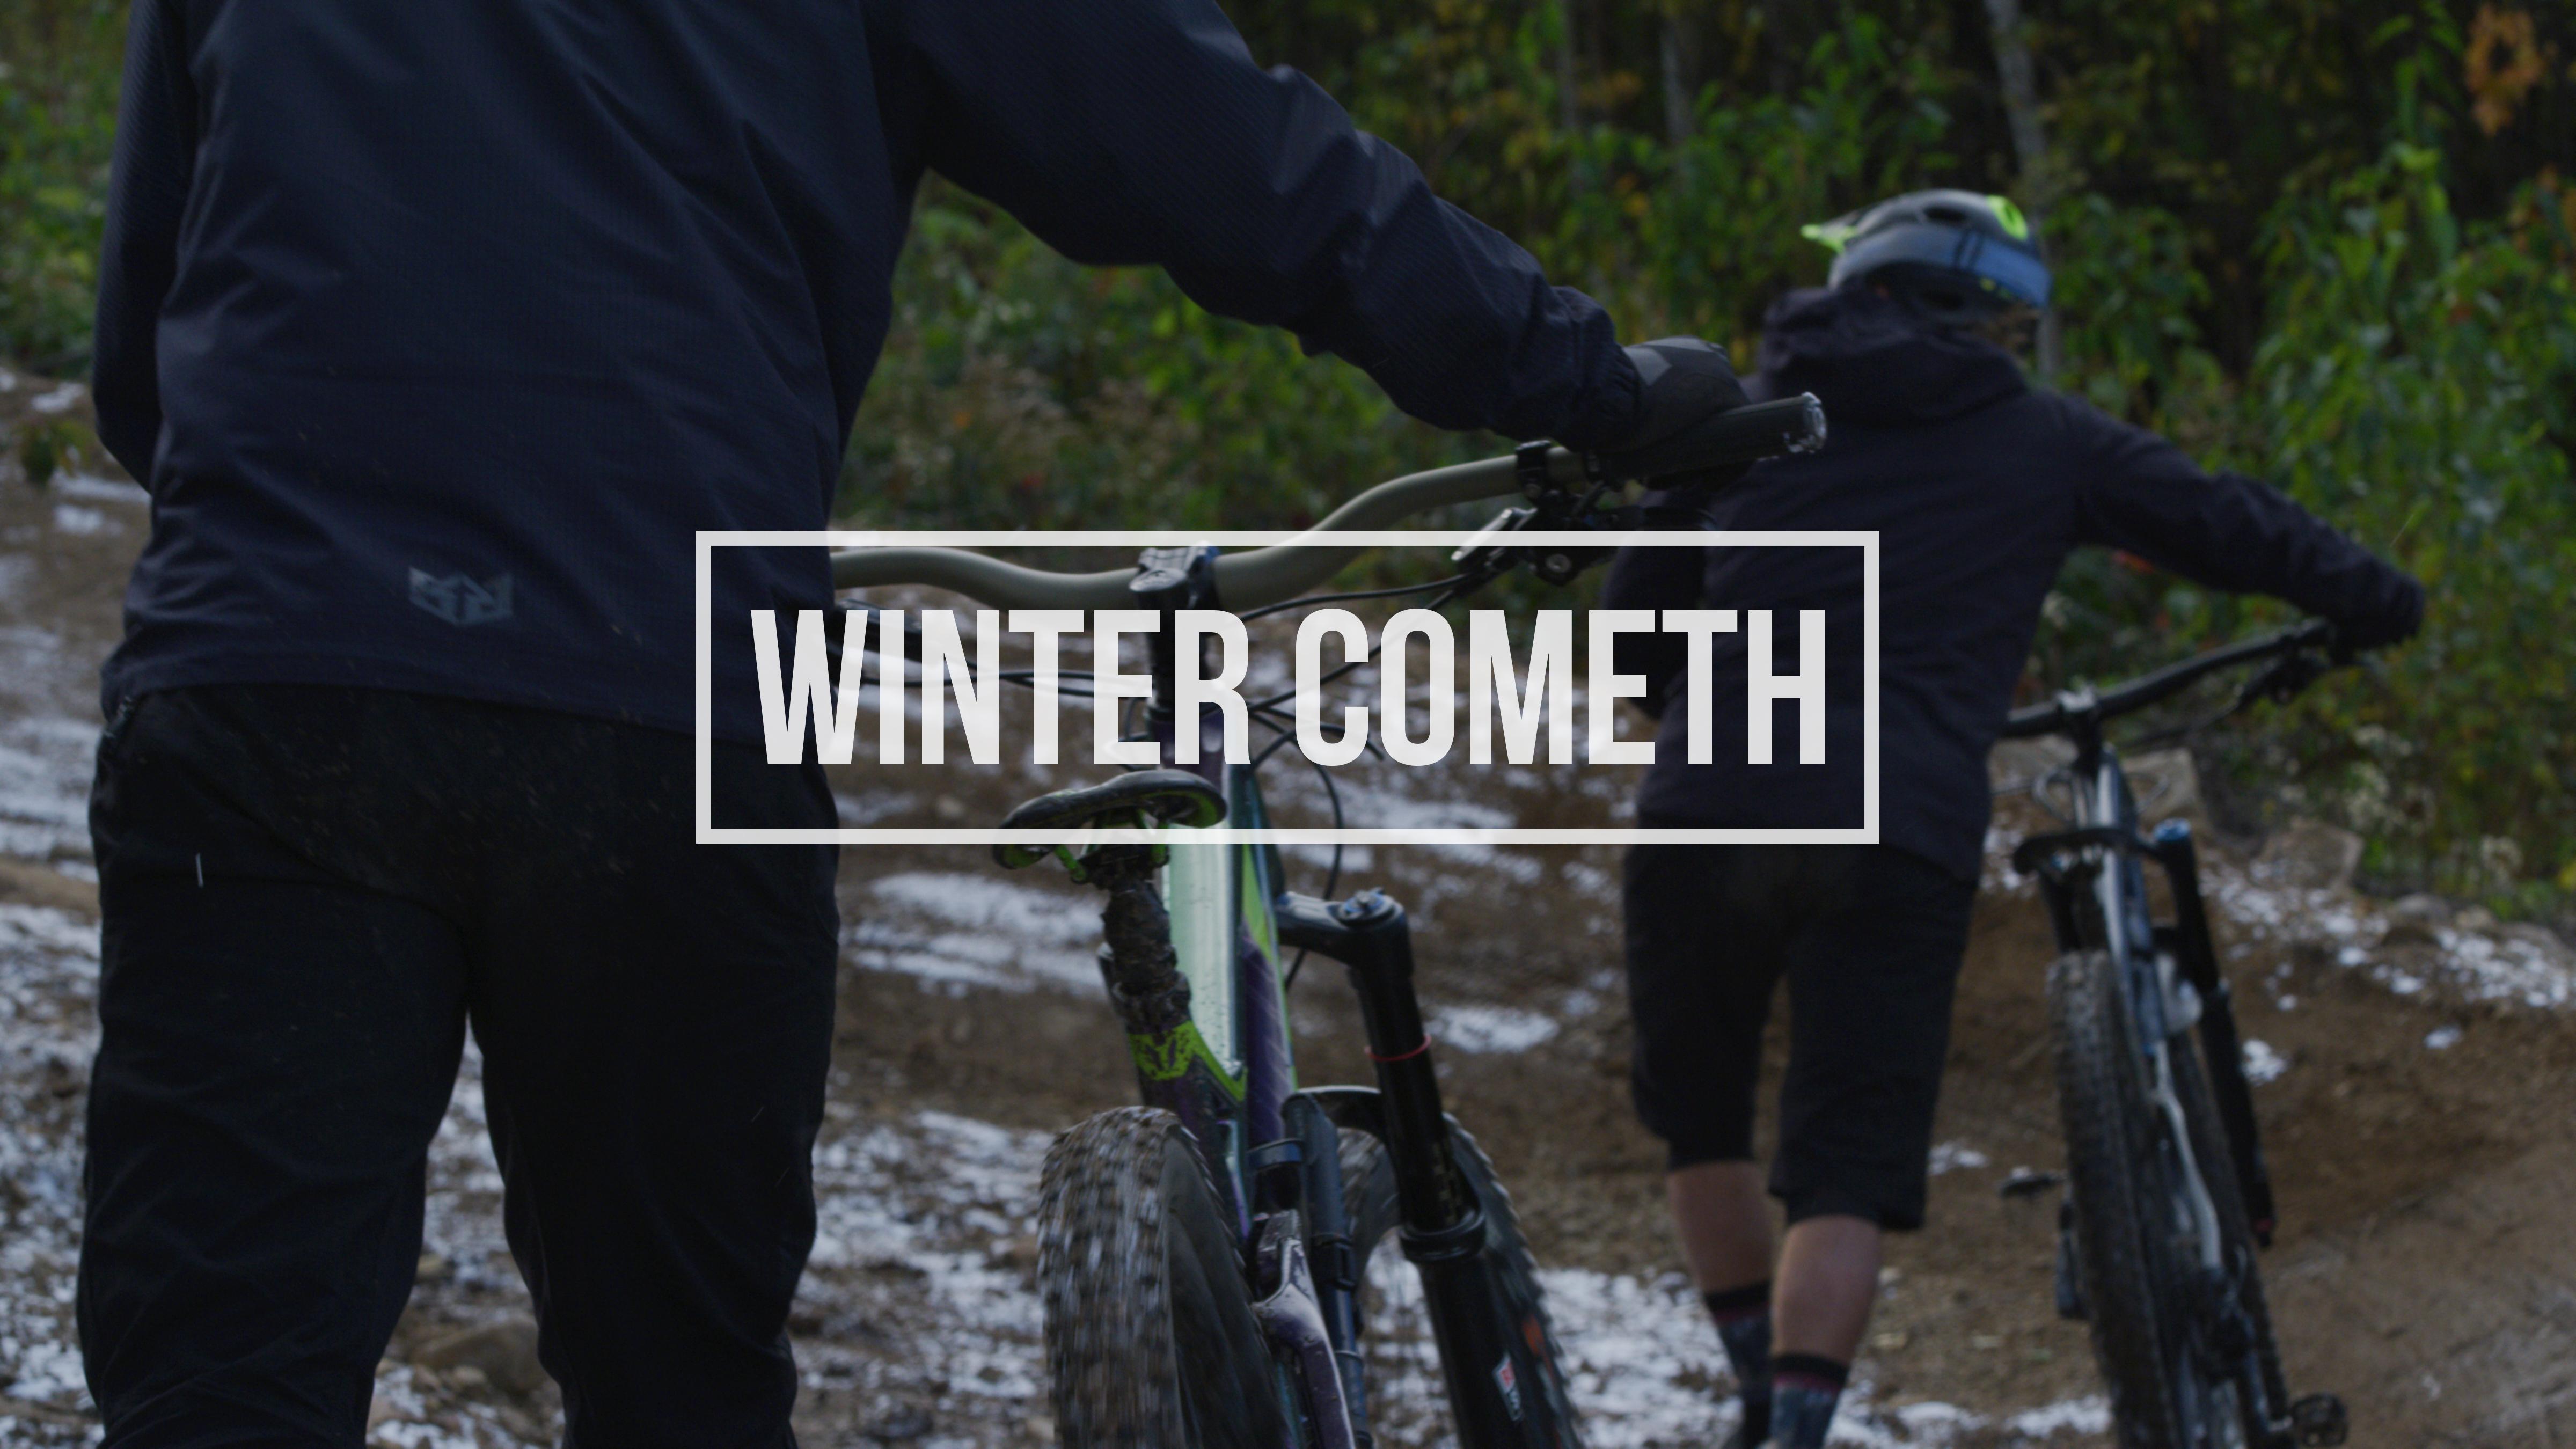 Northeast Raw 100 MTB: Winter Cometh